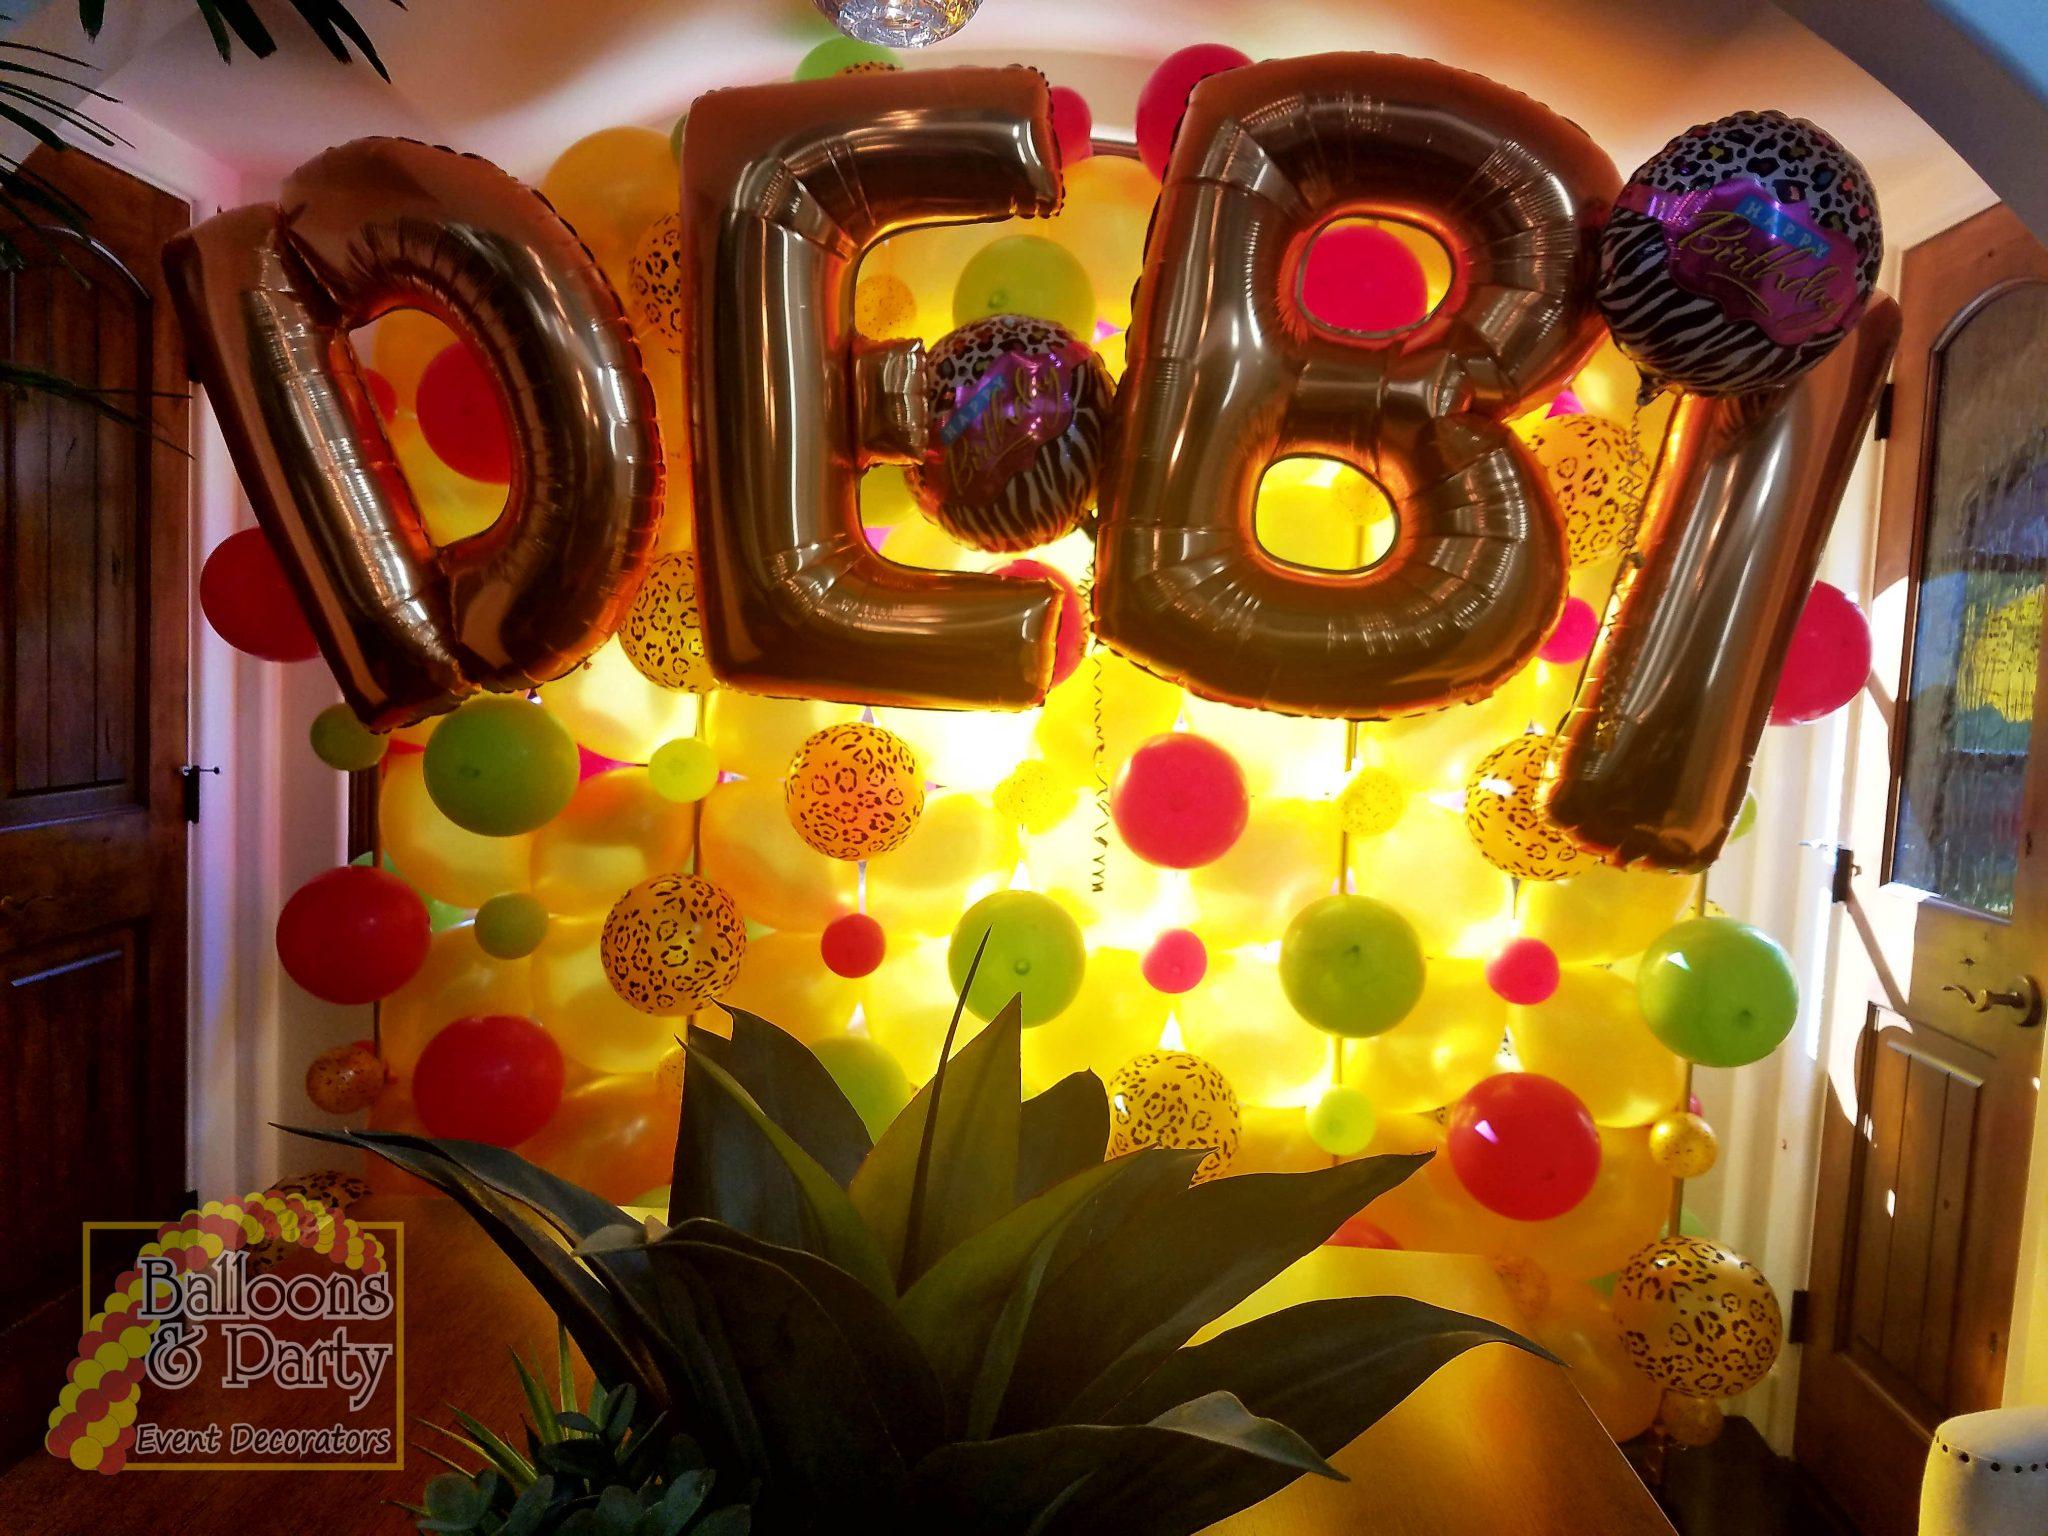 Balloon Walls-Backdrop Ideas - Balloons & Party Decorations